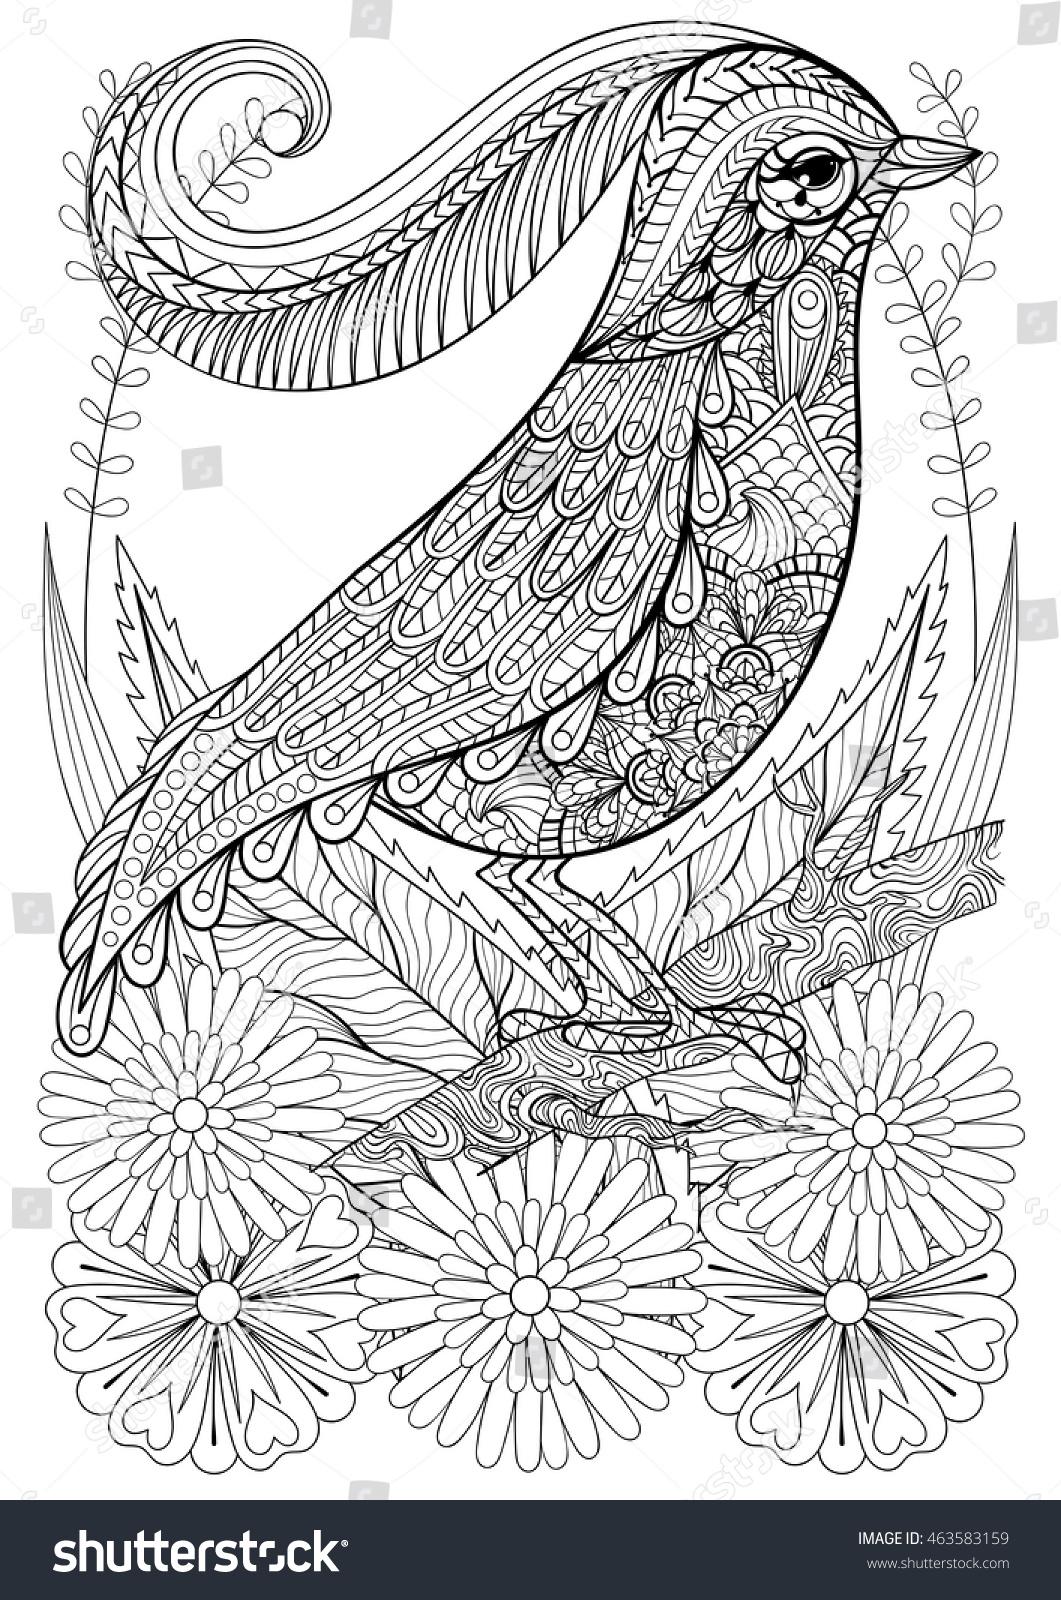 Zentangle Stylized Bird Flowers Hand Drawn Stock Vector 463583159